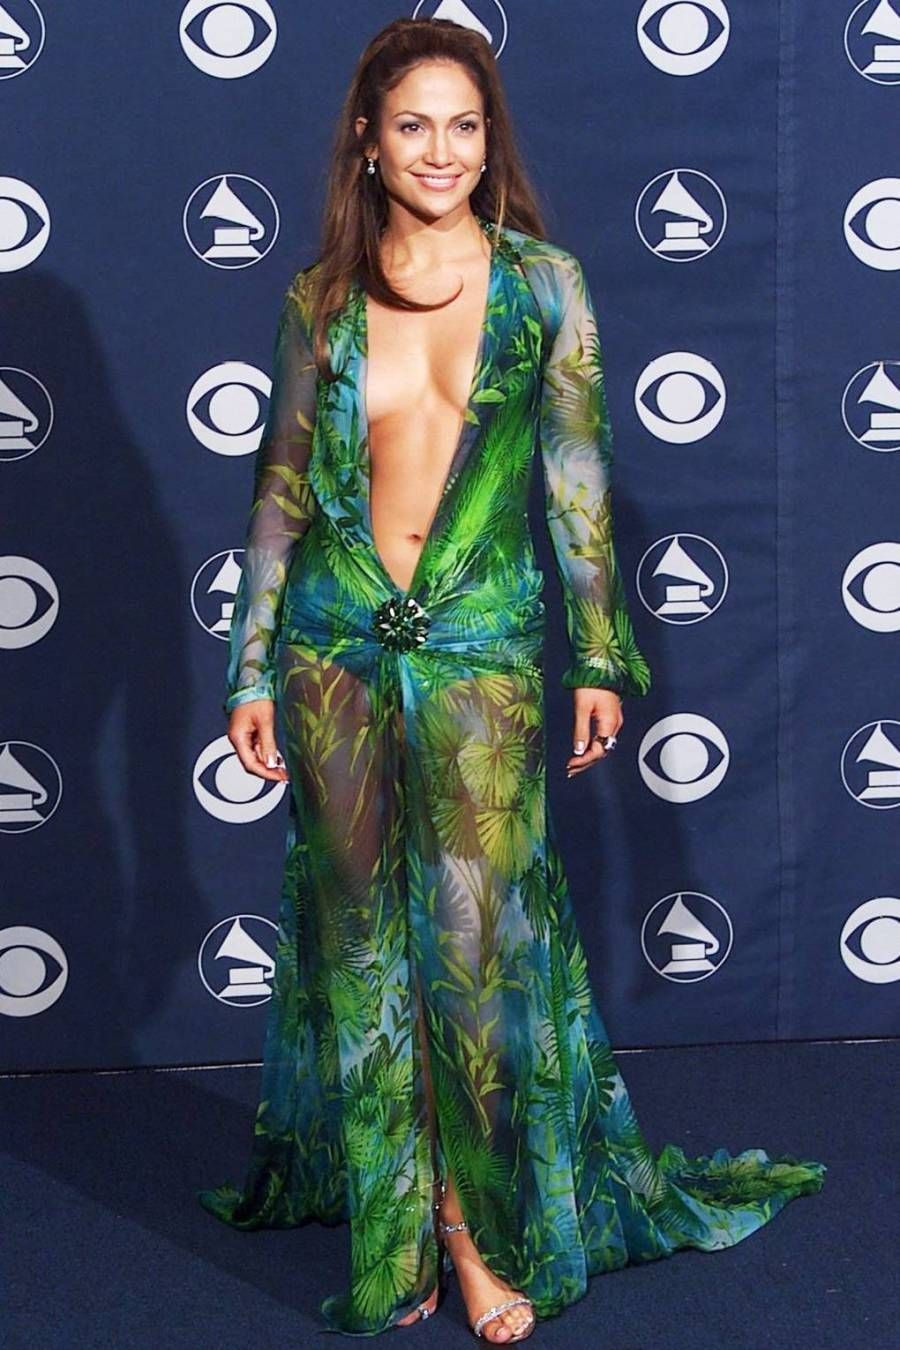 Jennifer Lopez Is Giving Us B T S Gist Of The Versace Dress Kaynuli Jennifer Lopez Green Dress Iconic Dresses Jennifer Lopez Versace Dress [ 1350 x 900 Pixel ]